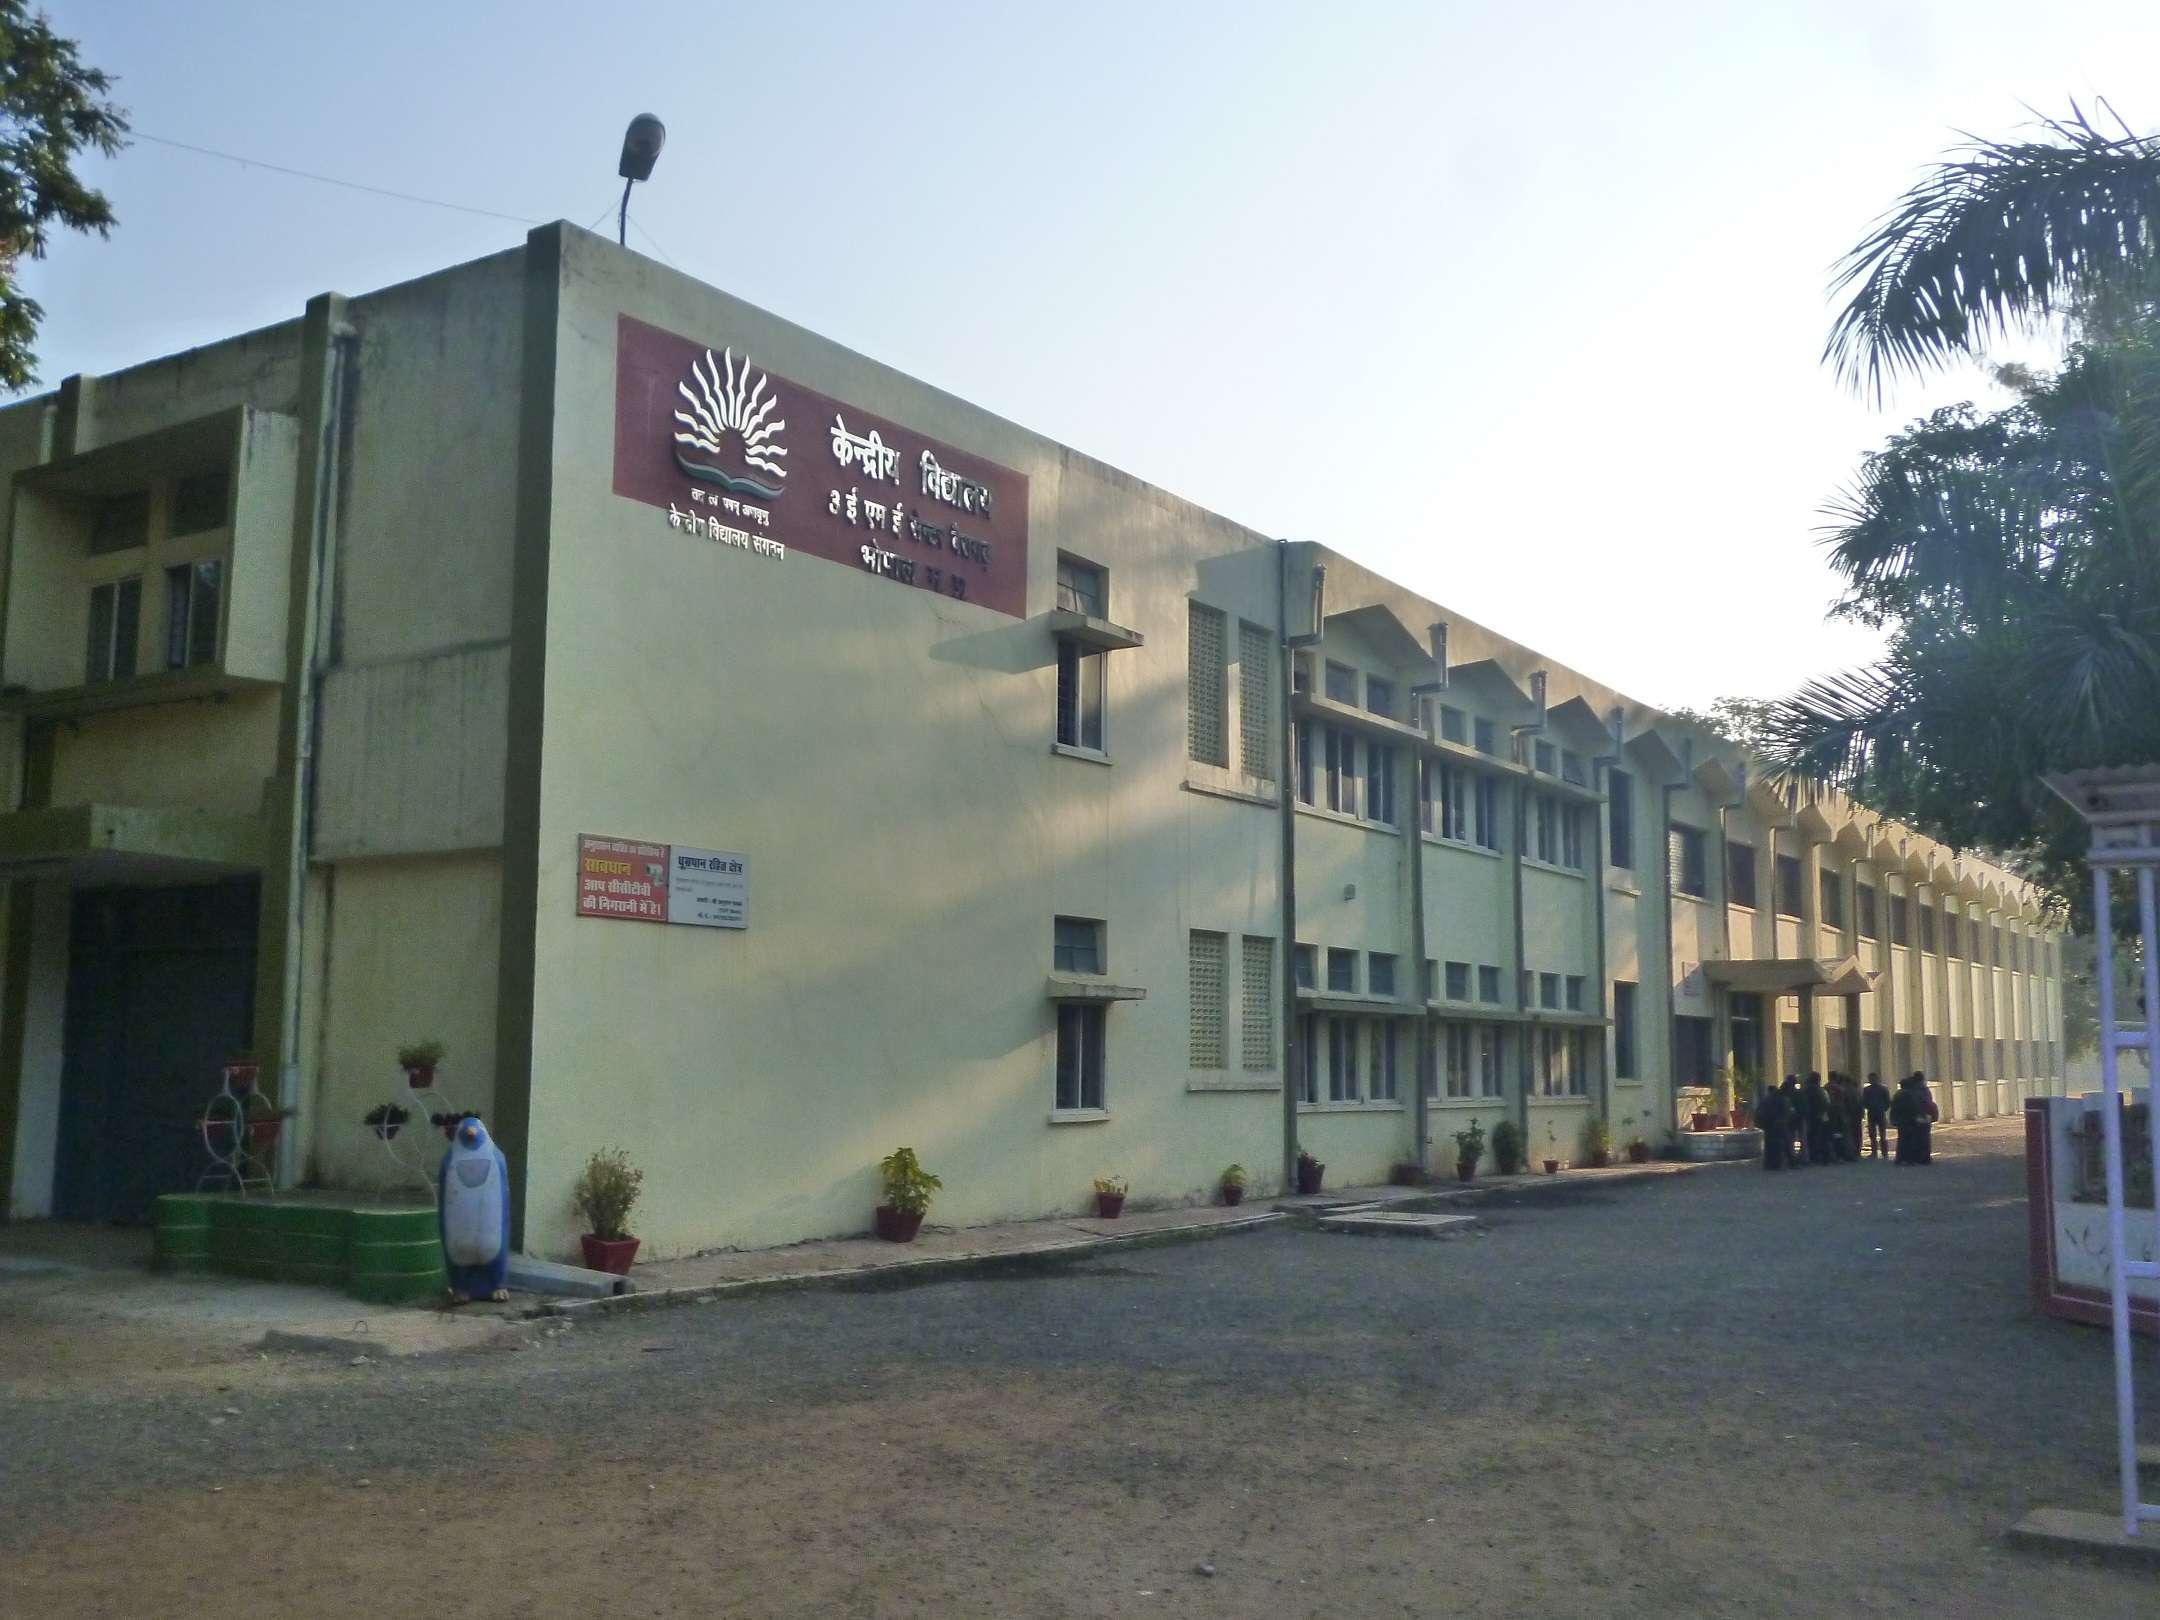 KENDRIYA VIDYALAYA 3 EME CENTRE BAIRAGARH BHOPAL MADHYA PRADESH 1000010